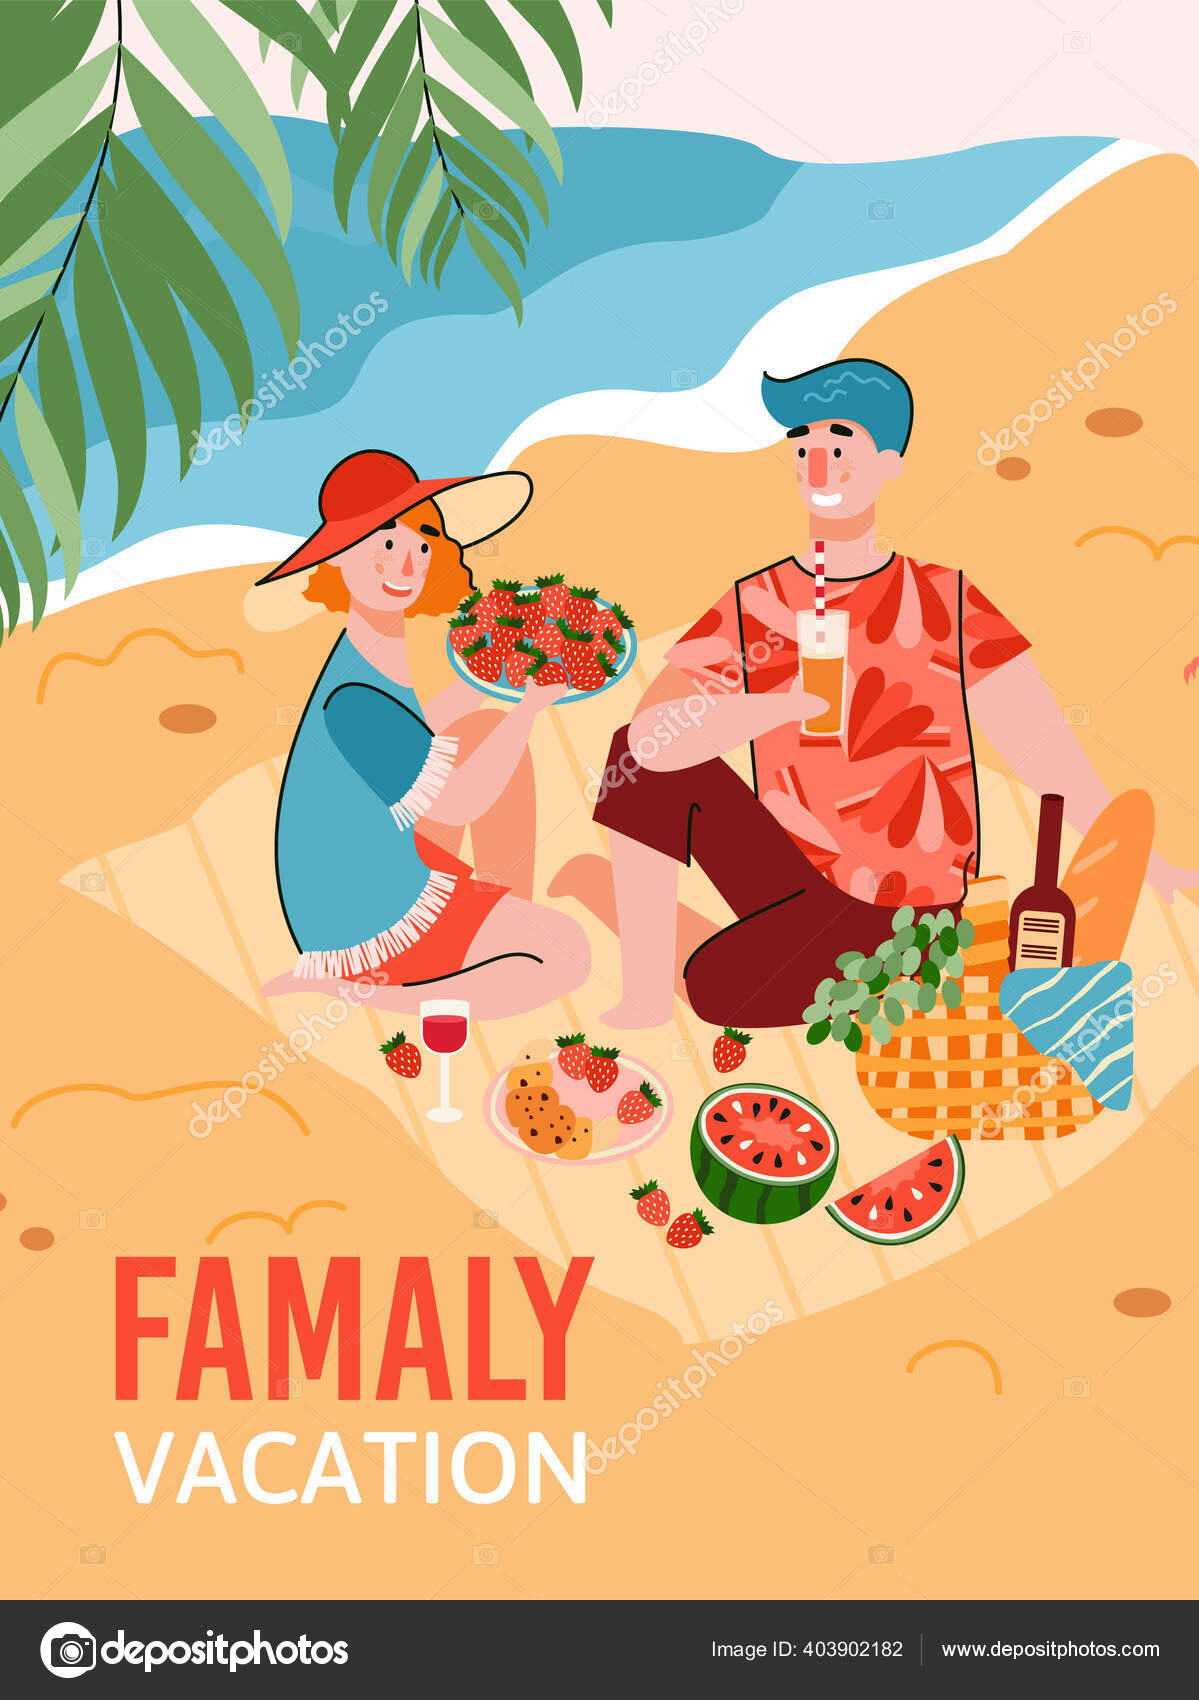 Family Vacation Banner Or Poster With Picnic Scene Cartoon Vector Illustration Stok Vektor C Rumka Vodki 403902182